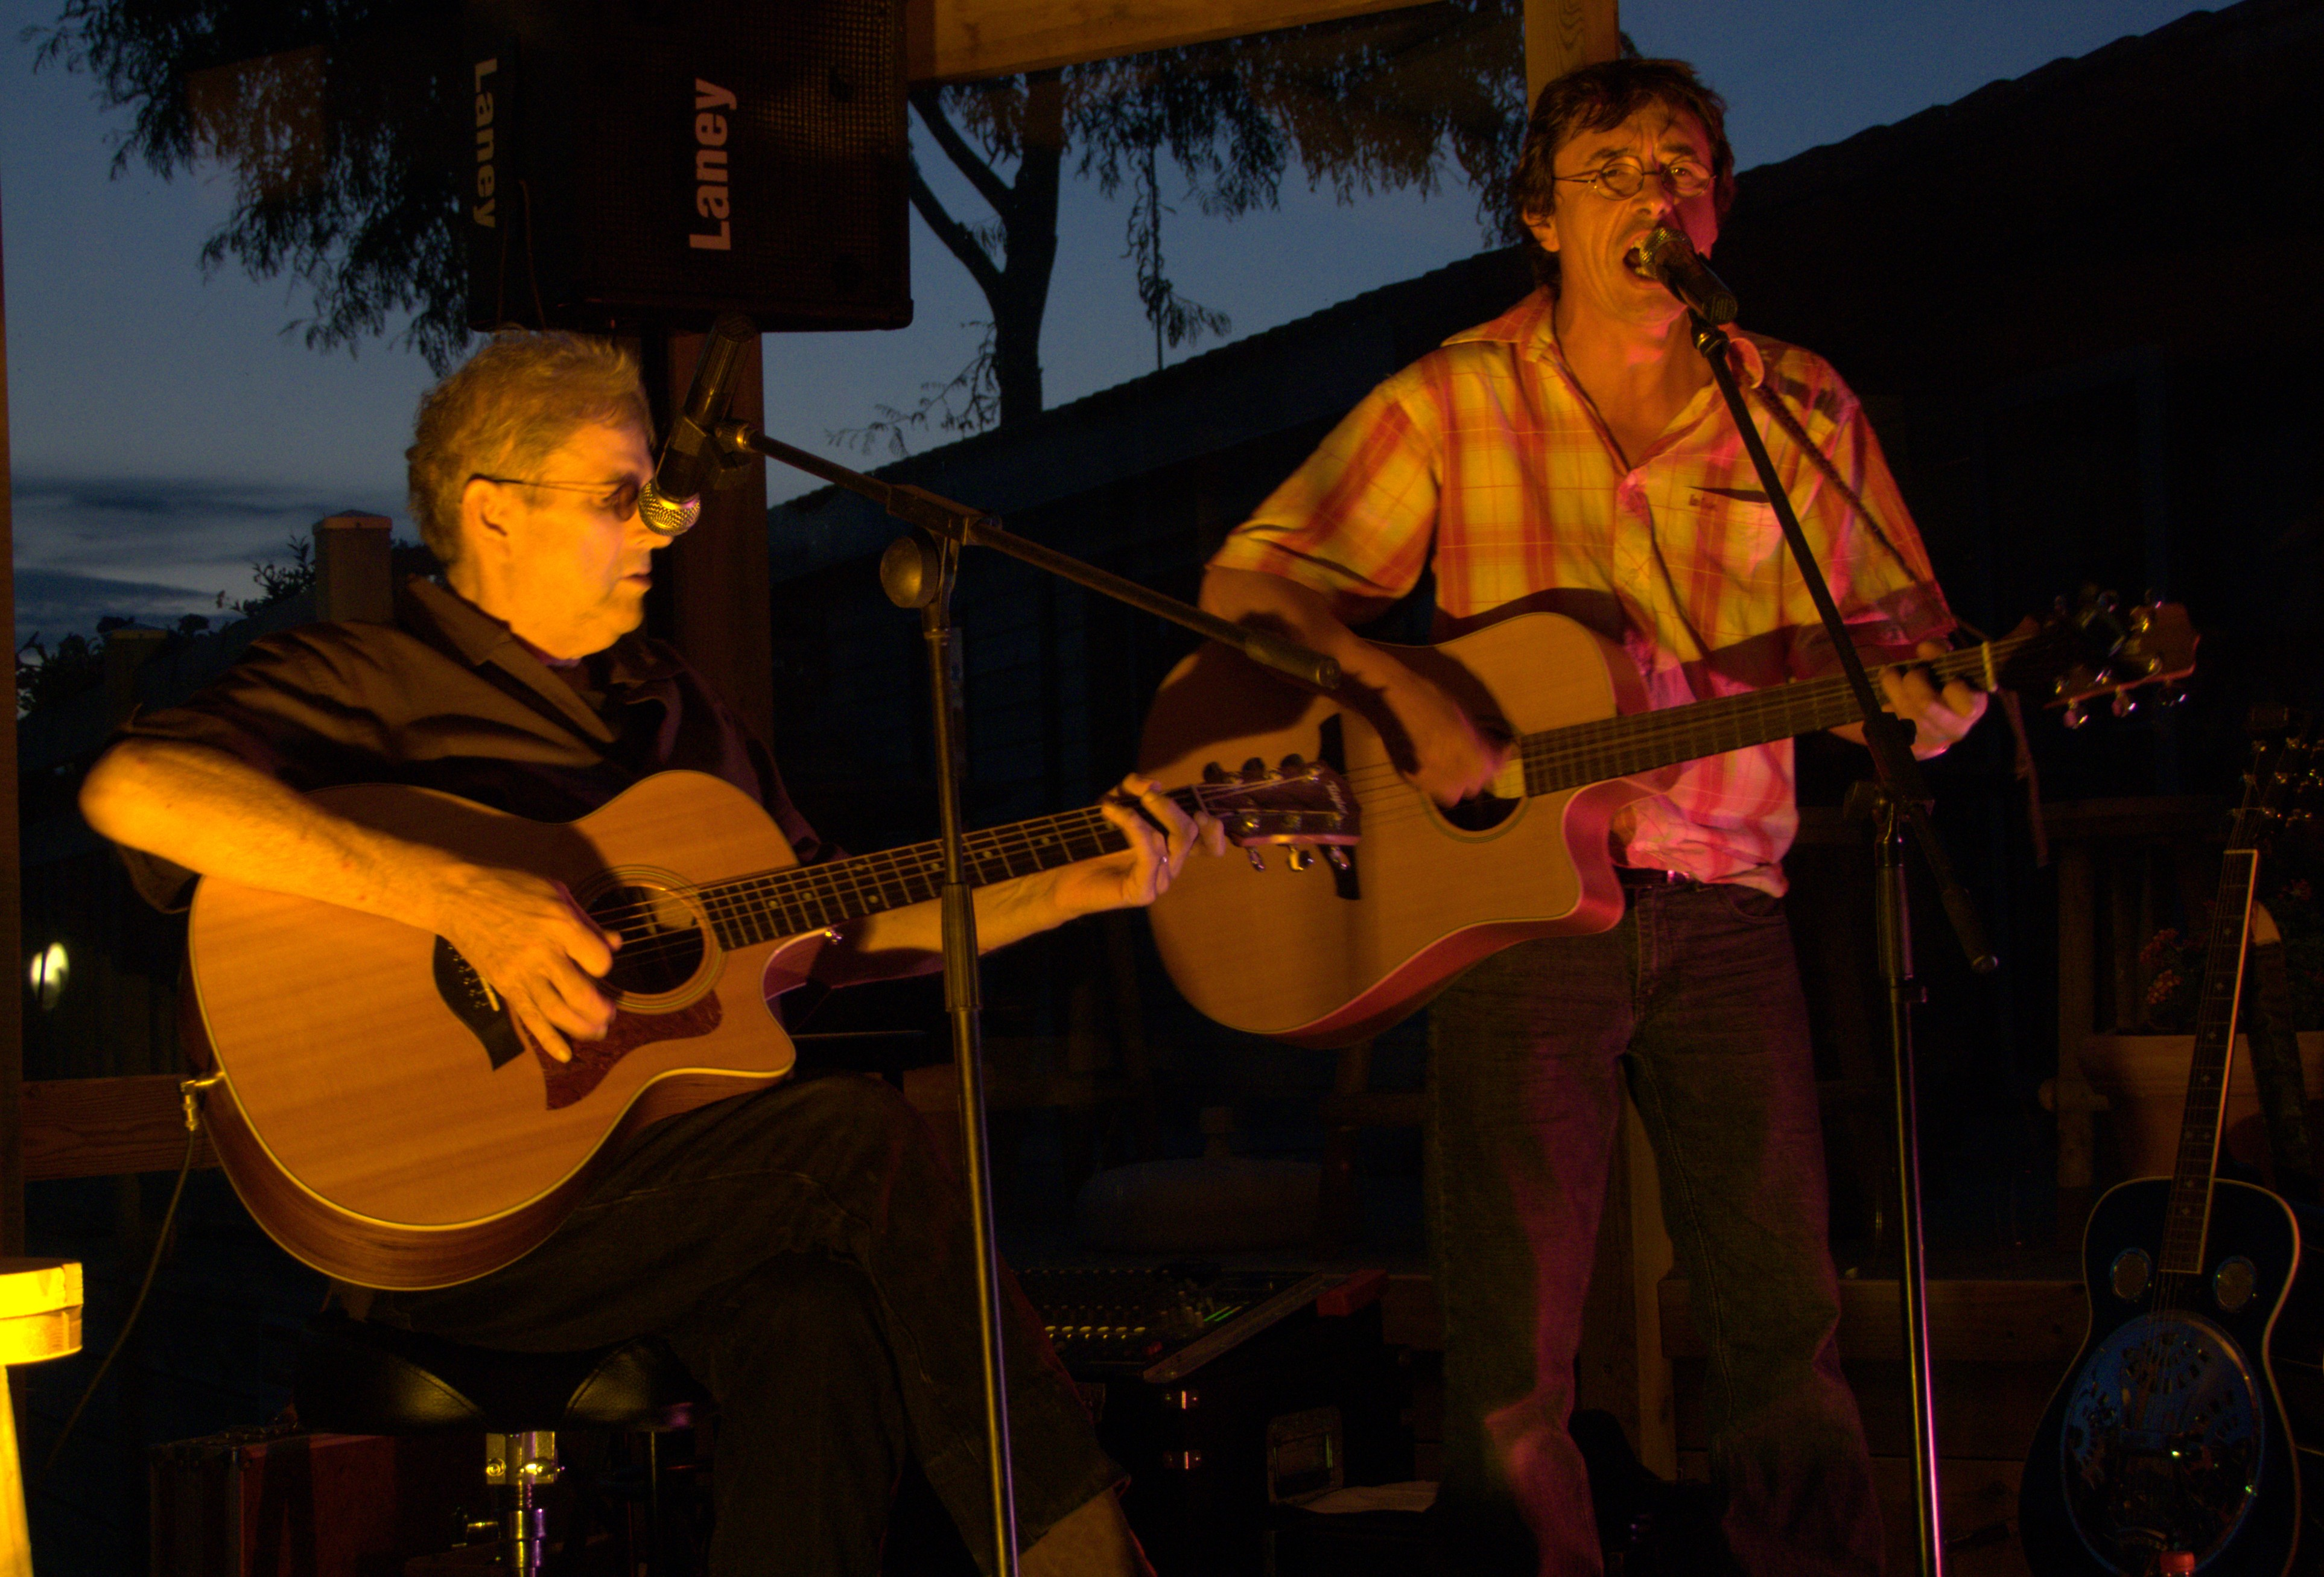 Binôme d'Attack et Pat et Yoyo en concert le vendredi 21 novembre au Korrigan